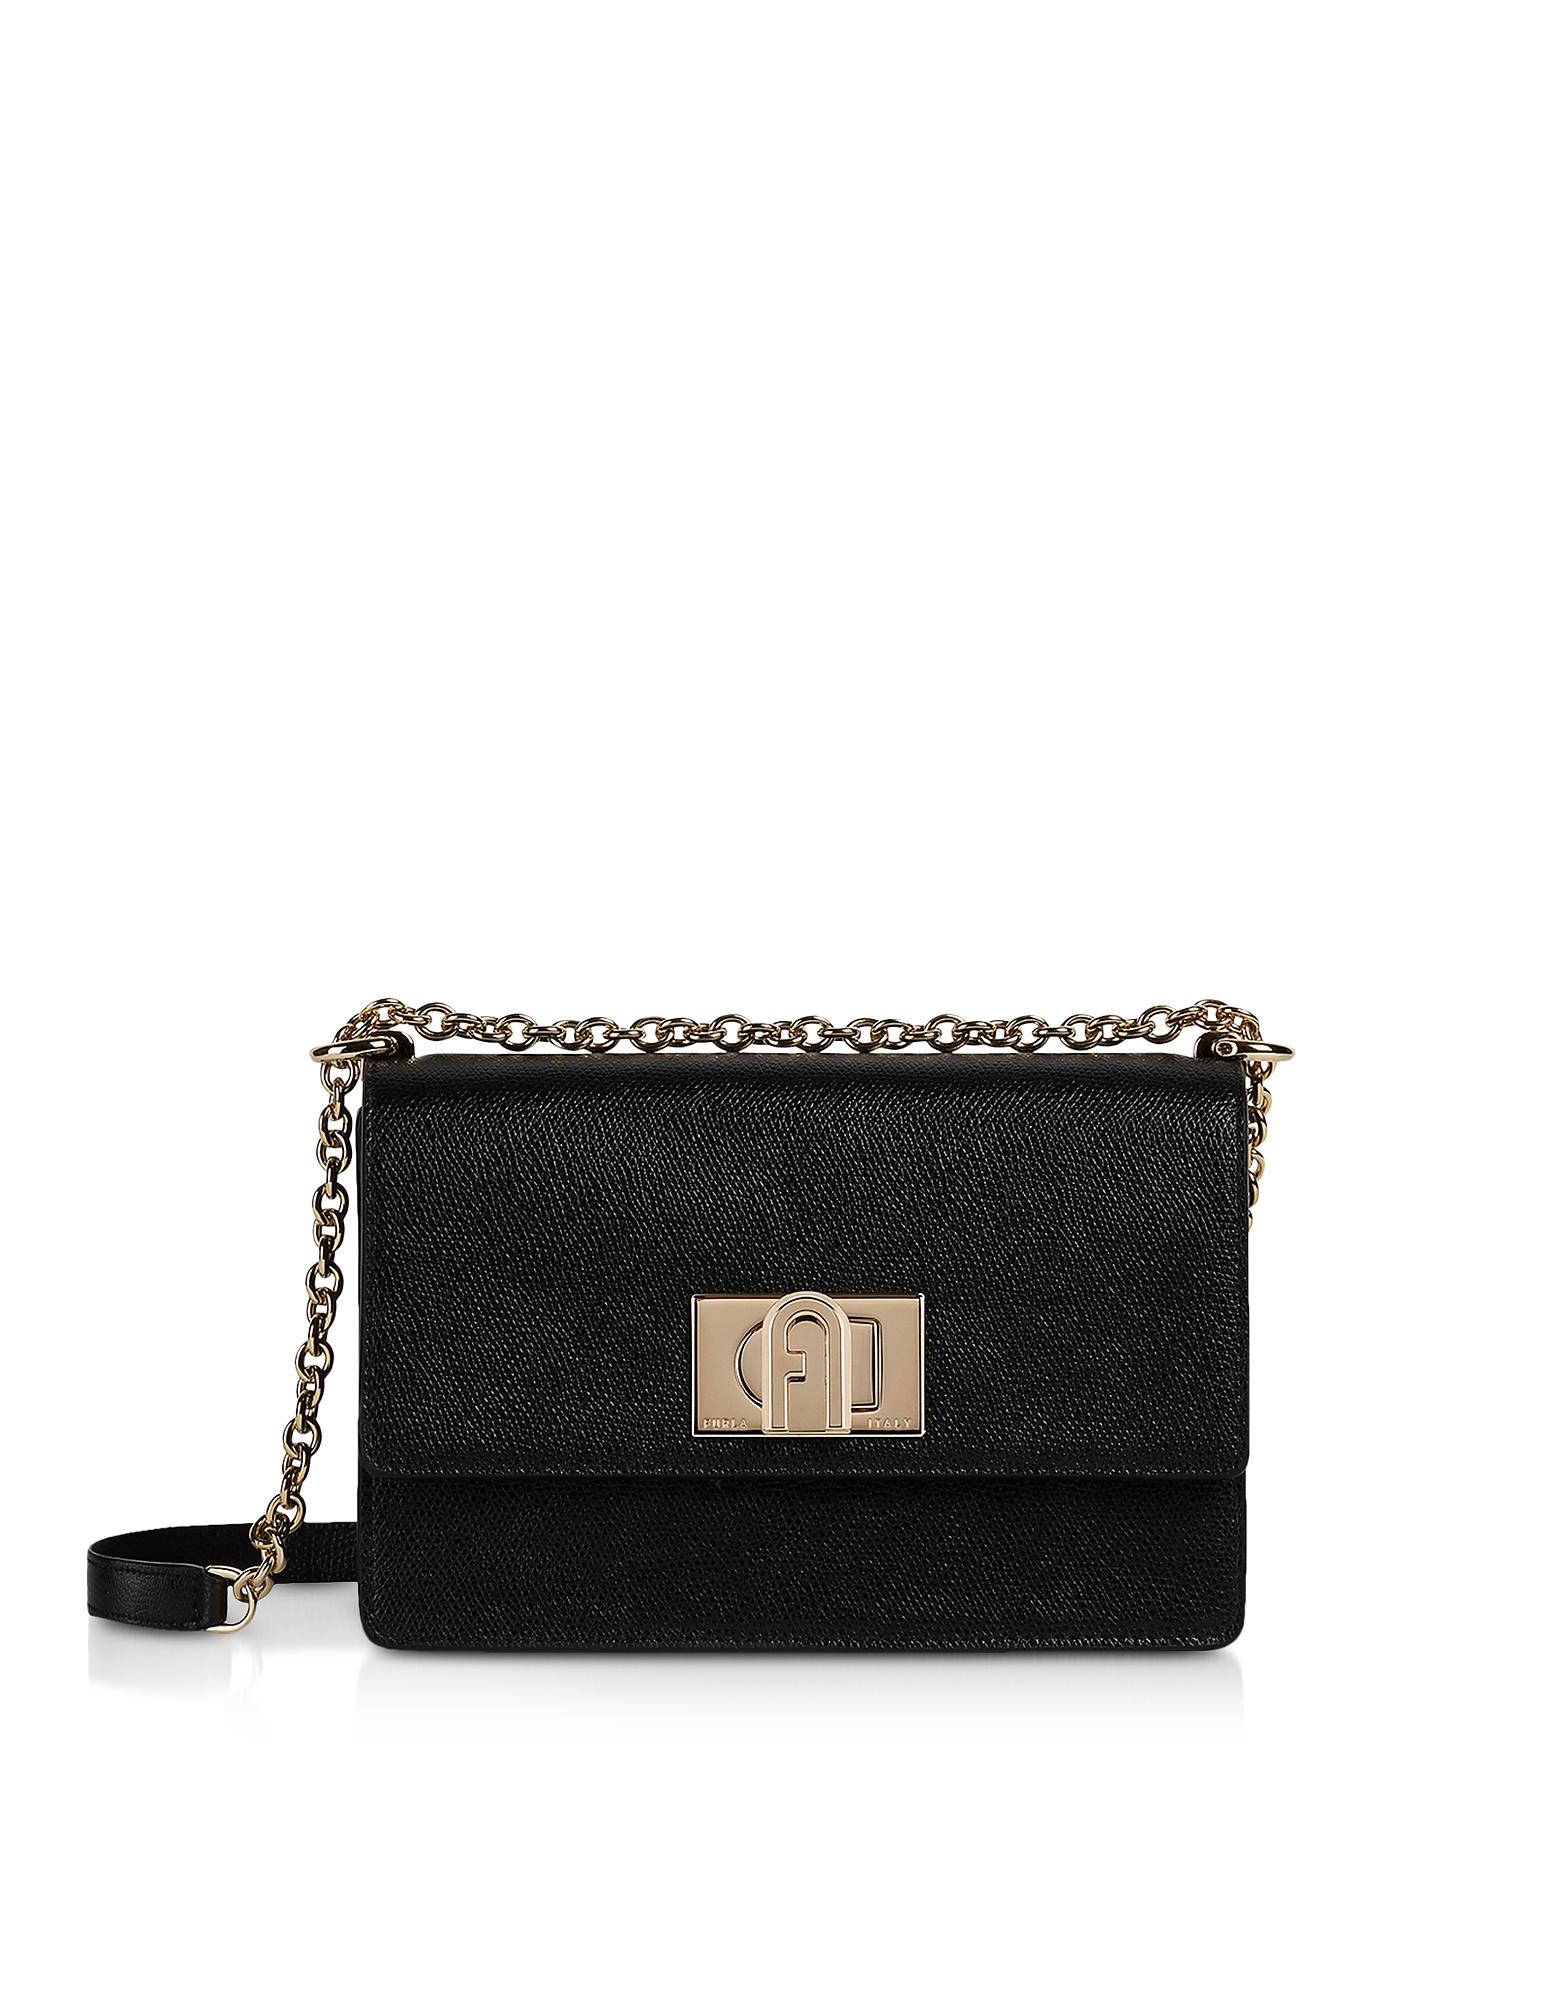 1927 Mini Crossbody Bag 20, Black